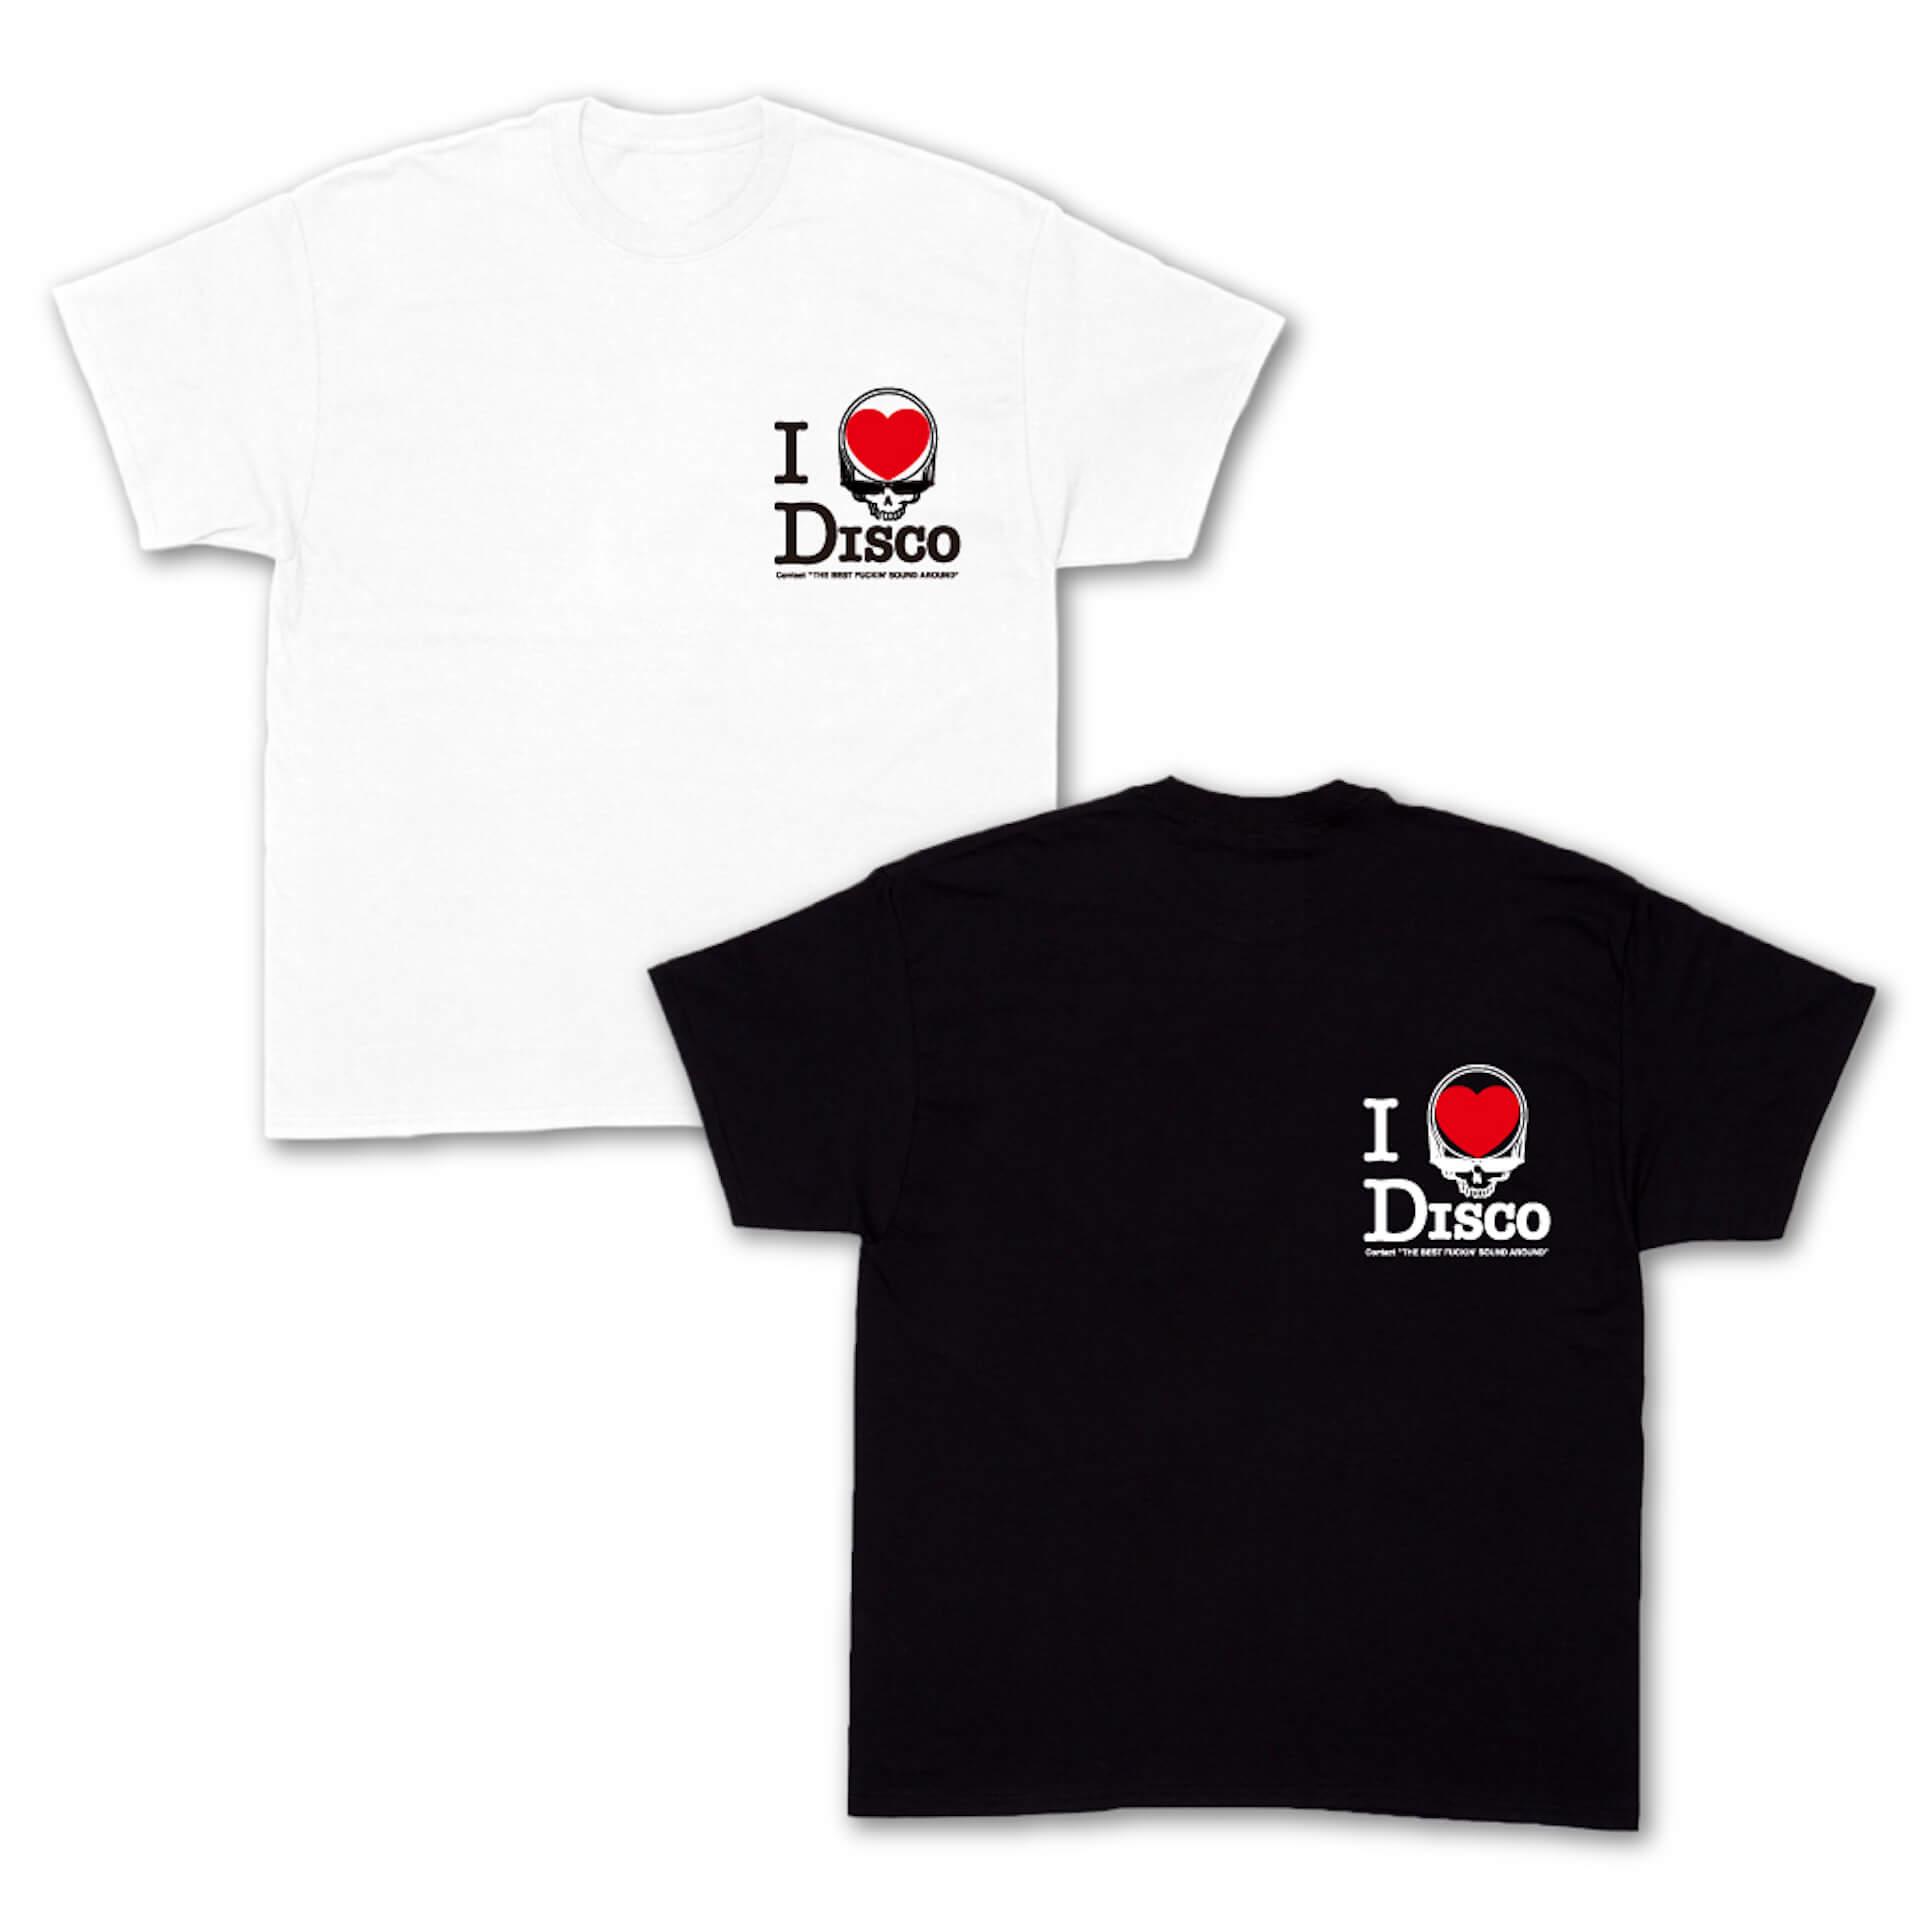 Contact Tokyo&SOUND MUSEUM VISIONのオリジナルデザインTシャツが発売決定!野村訓市、UNDERCOVER、VERDY、YAGIが参加 life210713_contact_vision_7